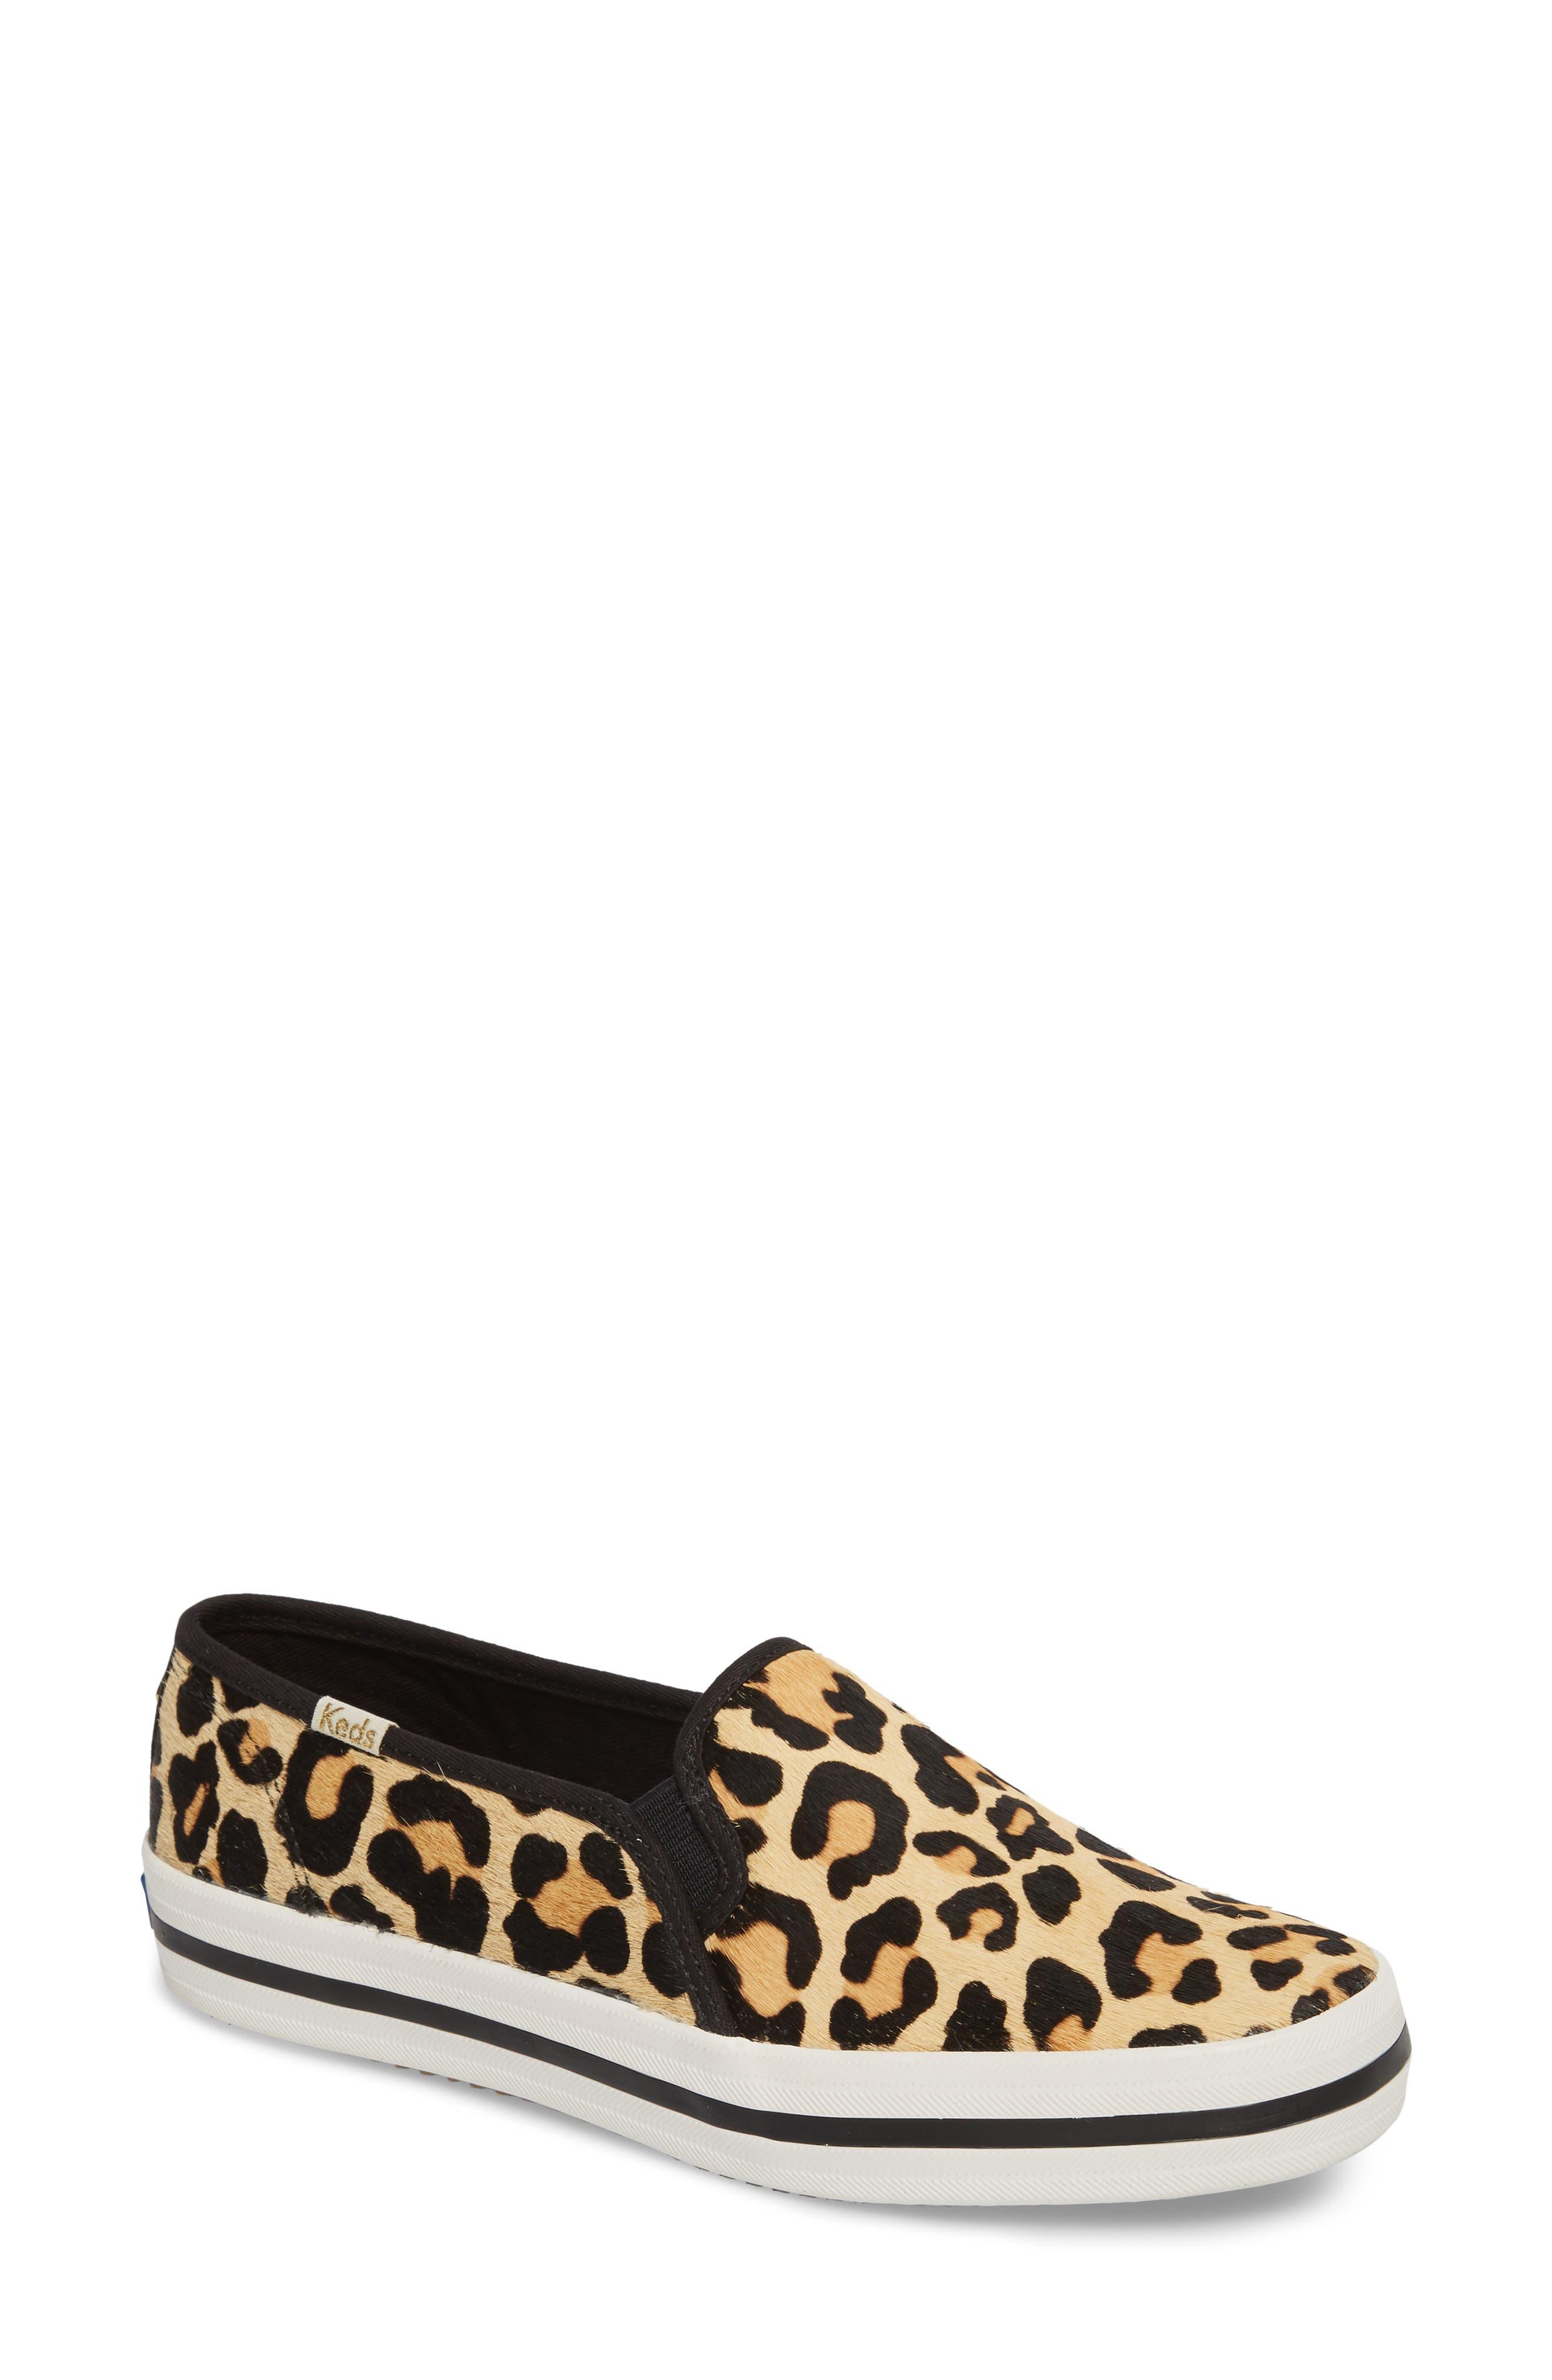 KEDS<SUP>®</SUP> FOR KATE SPADE NEW YORK, Keds<sup>®</sup> x kate spade Double Decker Slip-On Sneaker, Main thumbnail 1, color, TAN PONY HAIR